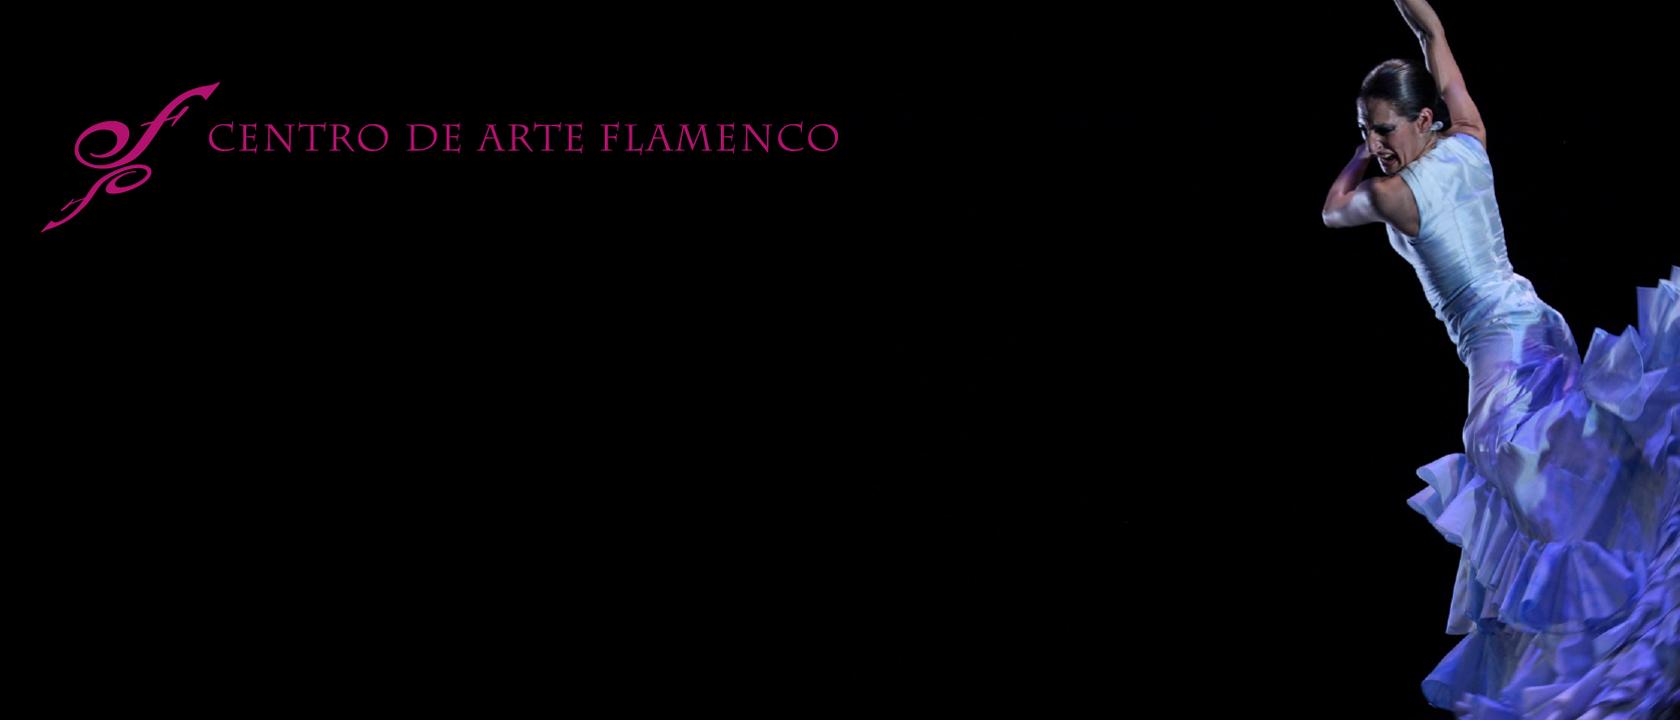 Flamencoworkshops mit Úrsula López: Juli 2016